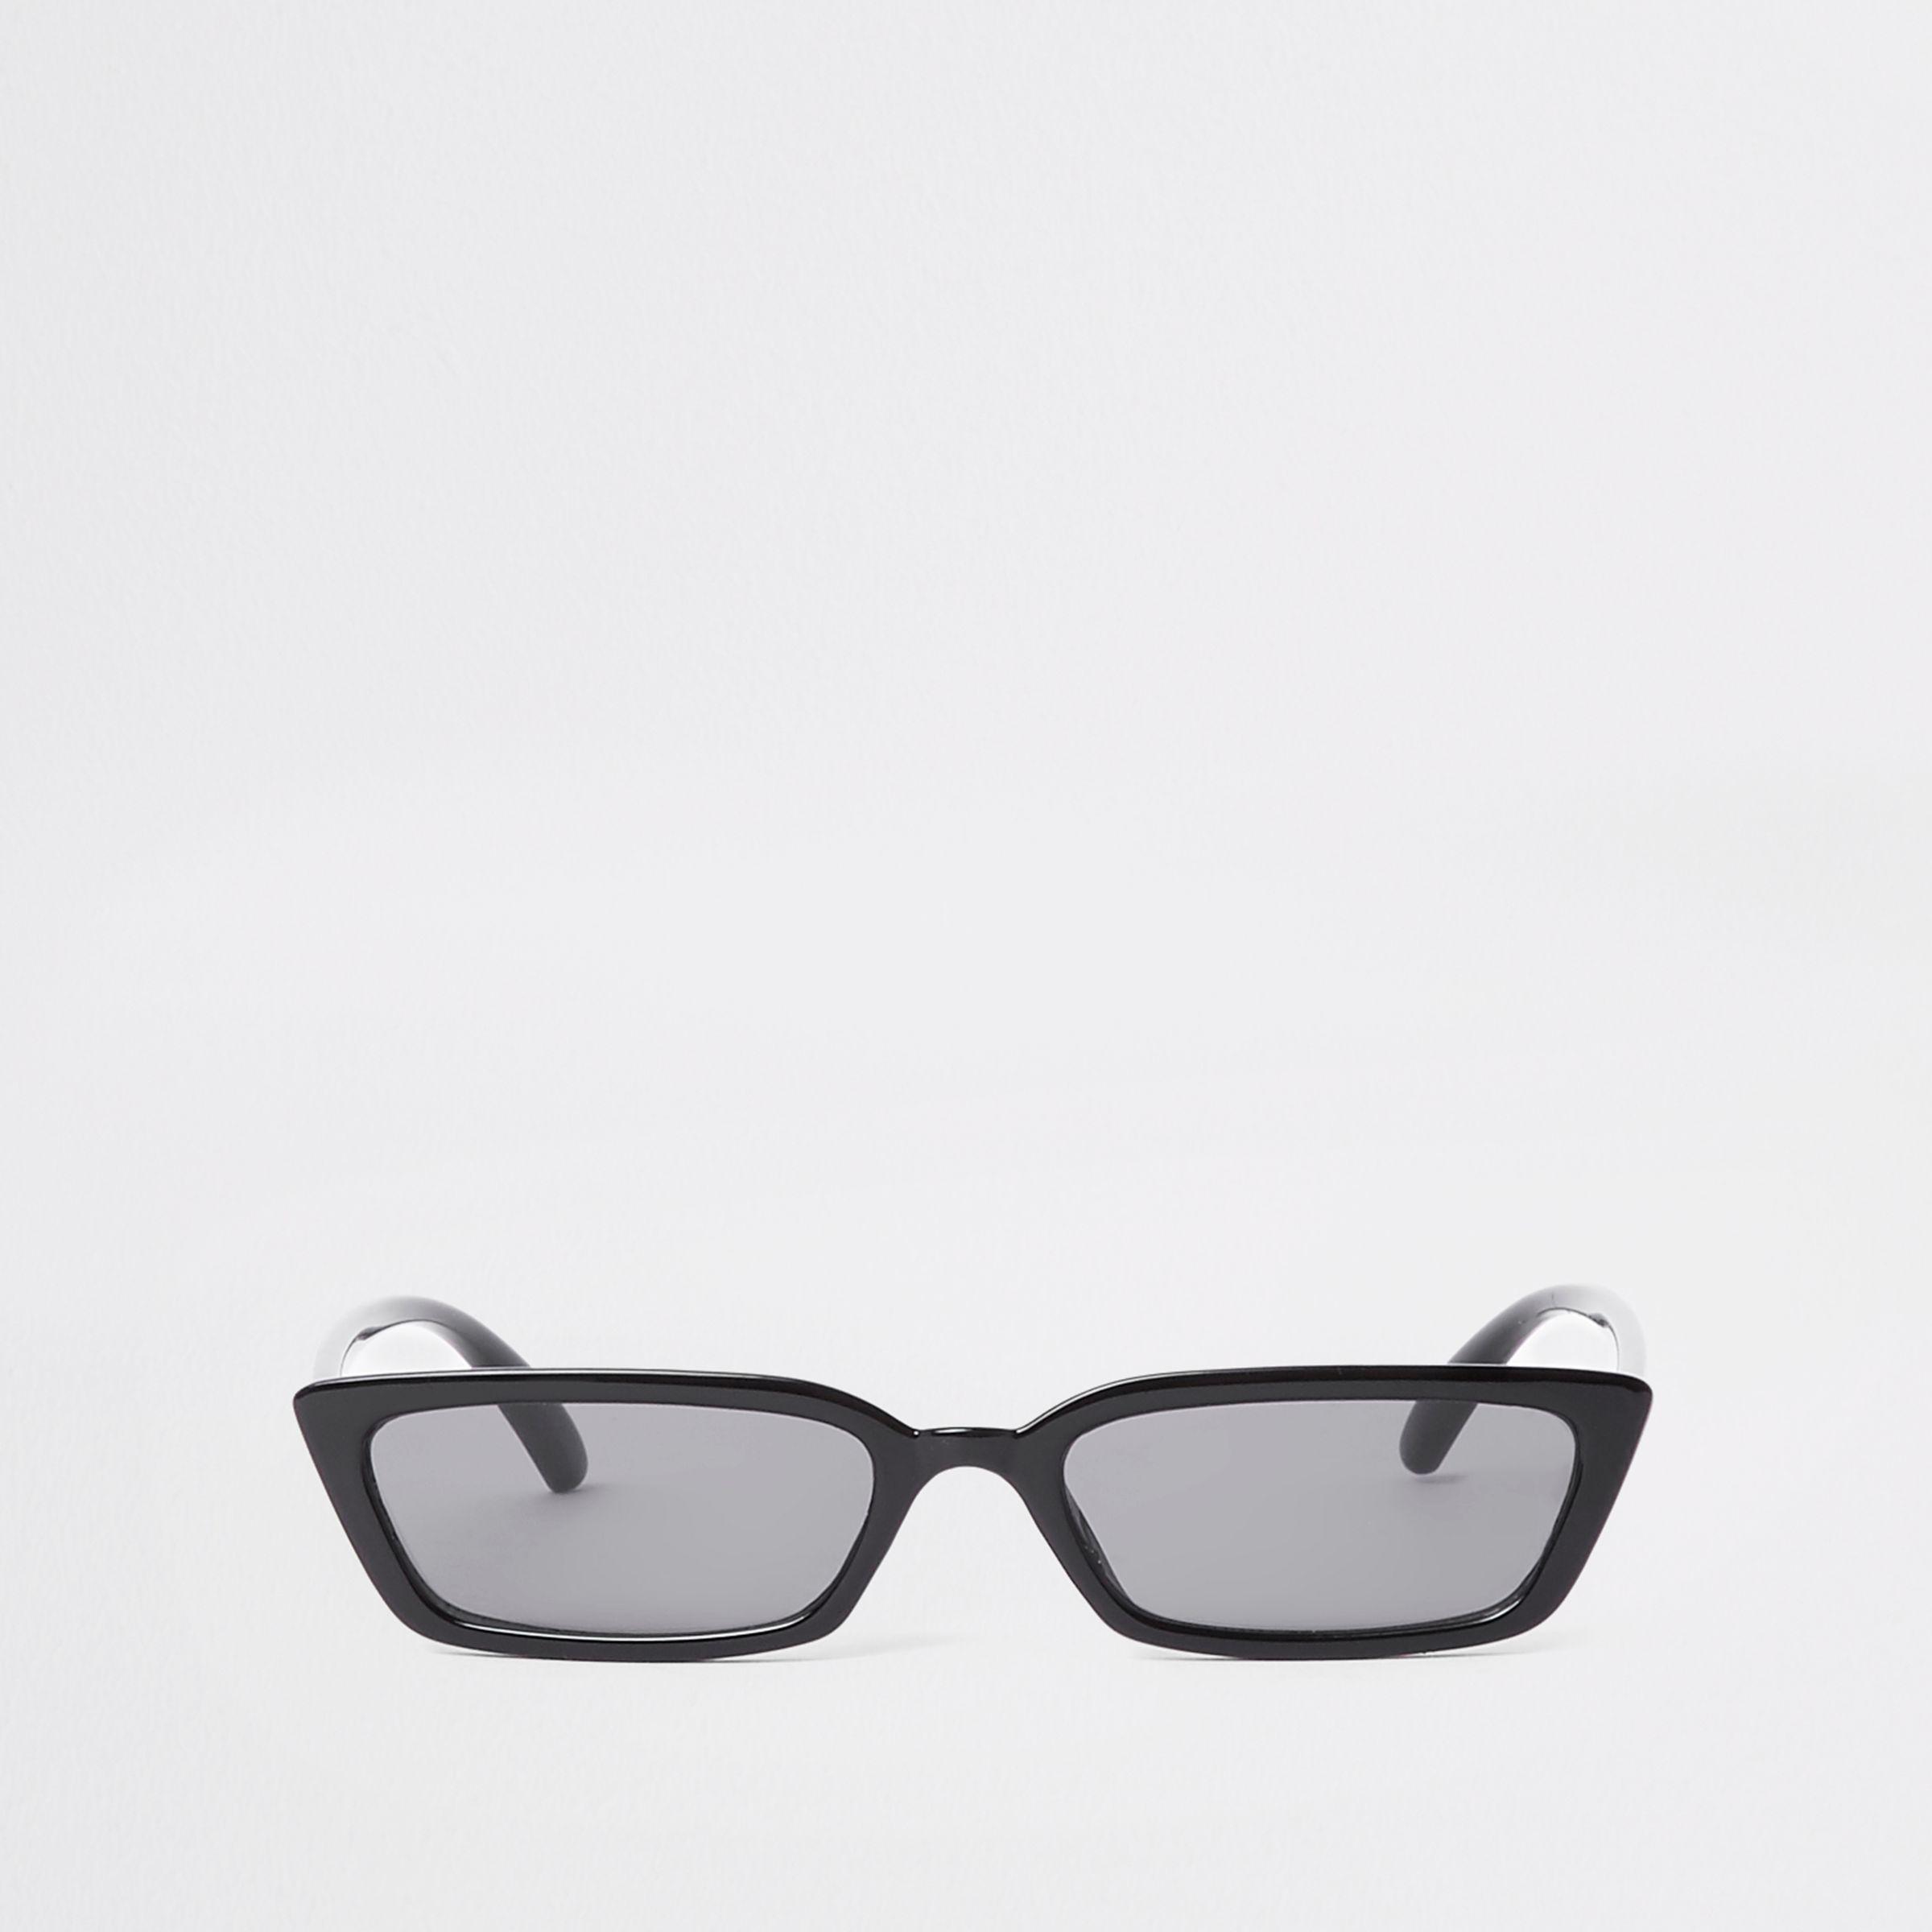 9f25156630c Lyst - River Island Slim Frame Smoke Lens Sunglasses in Black